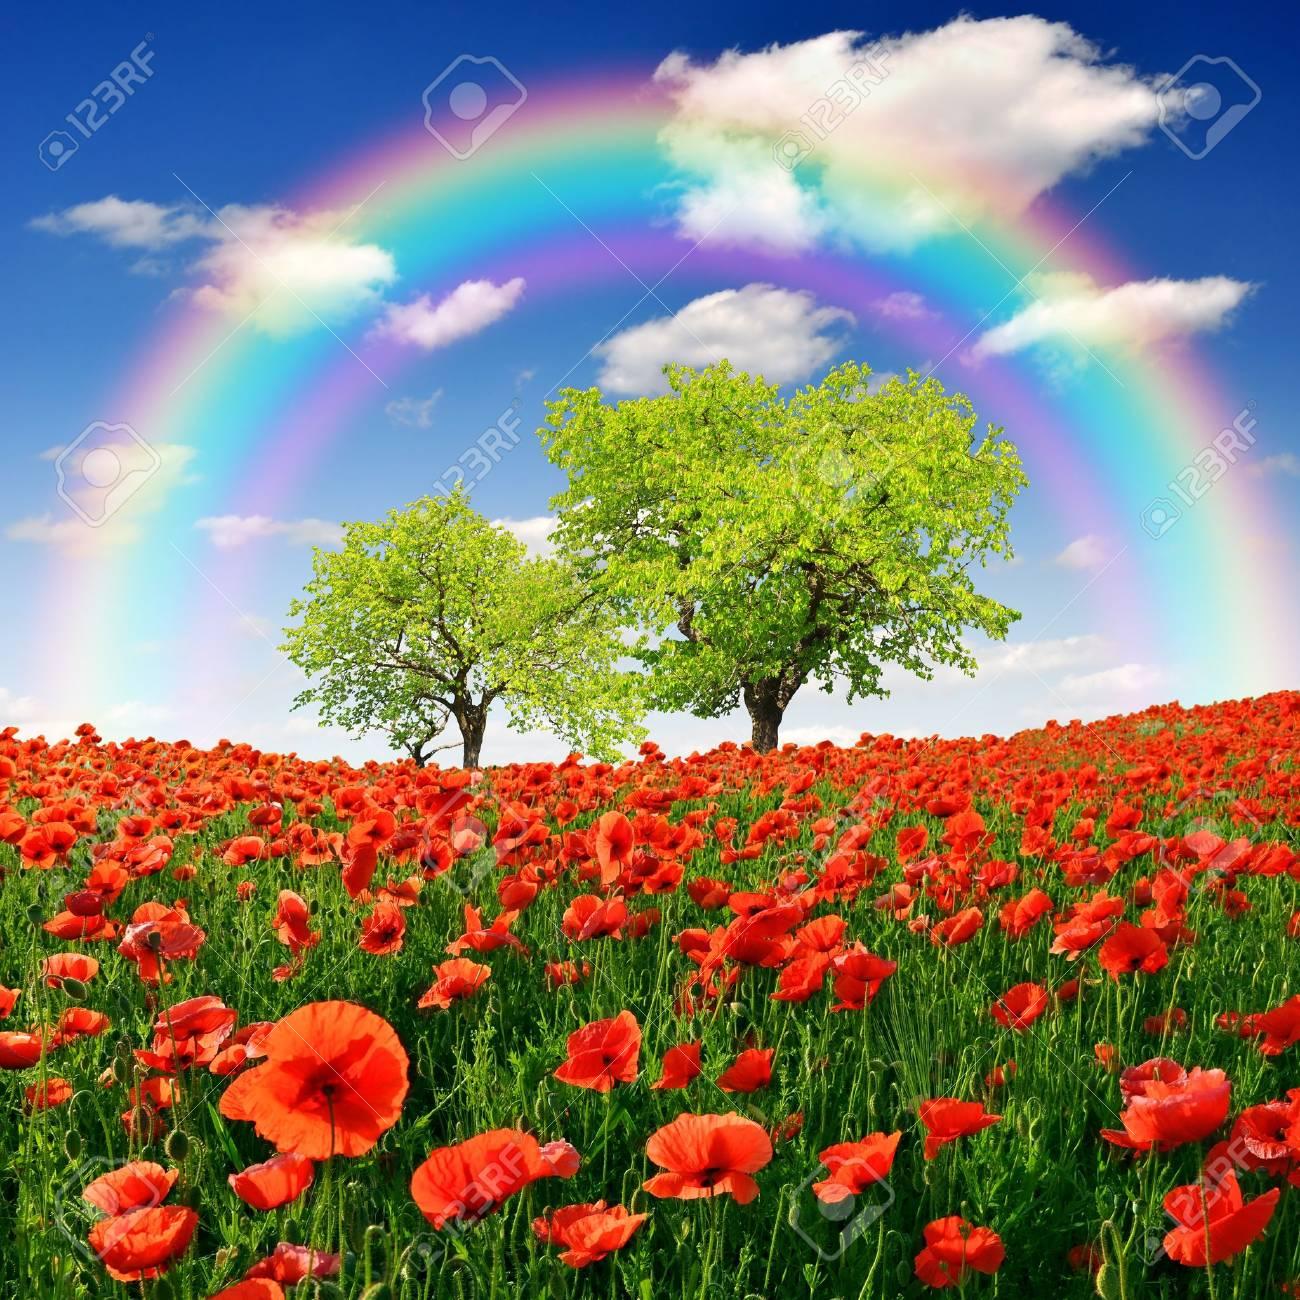 arco iris sobre el paisaje de primavera con la amapola roja